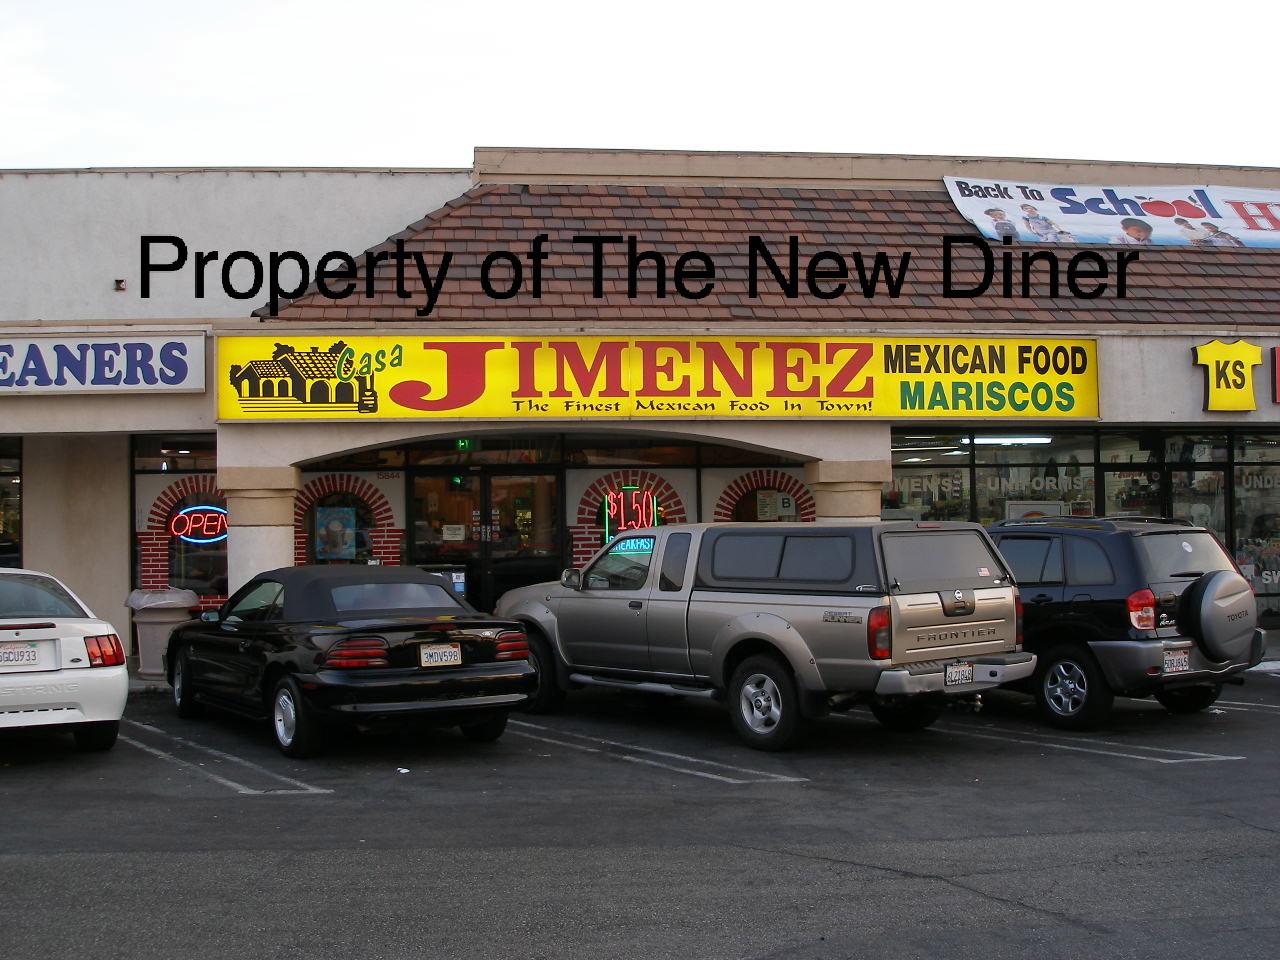 The New Diner: Casa Jimenez